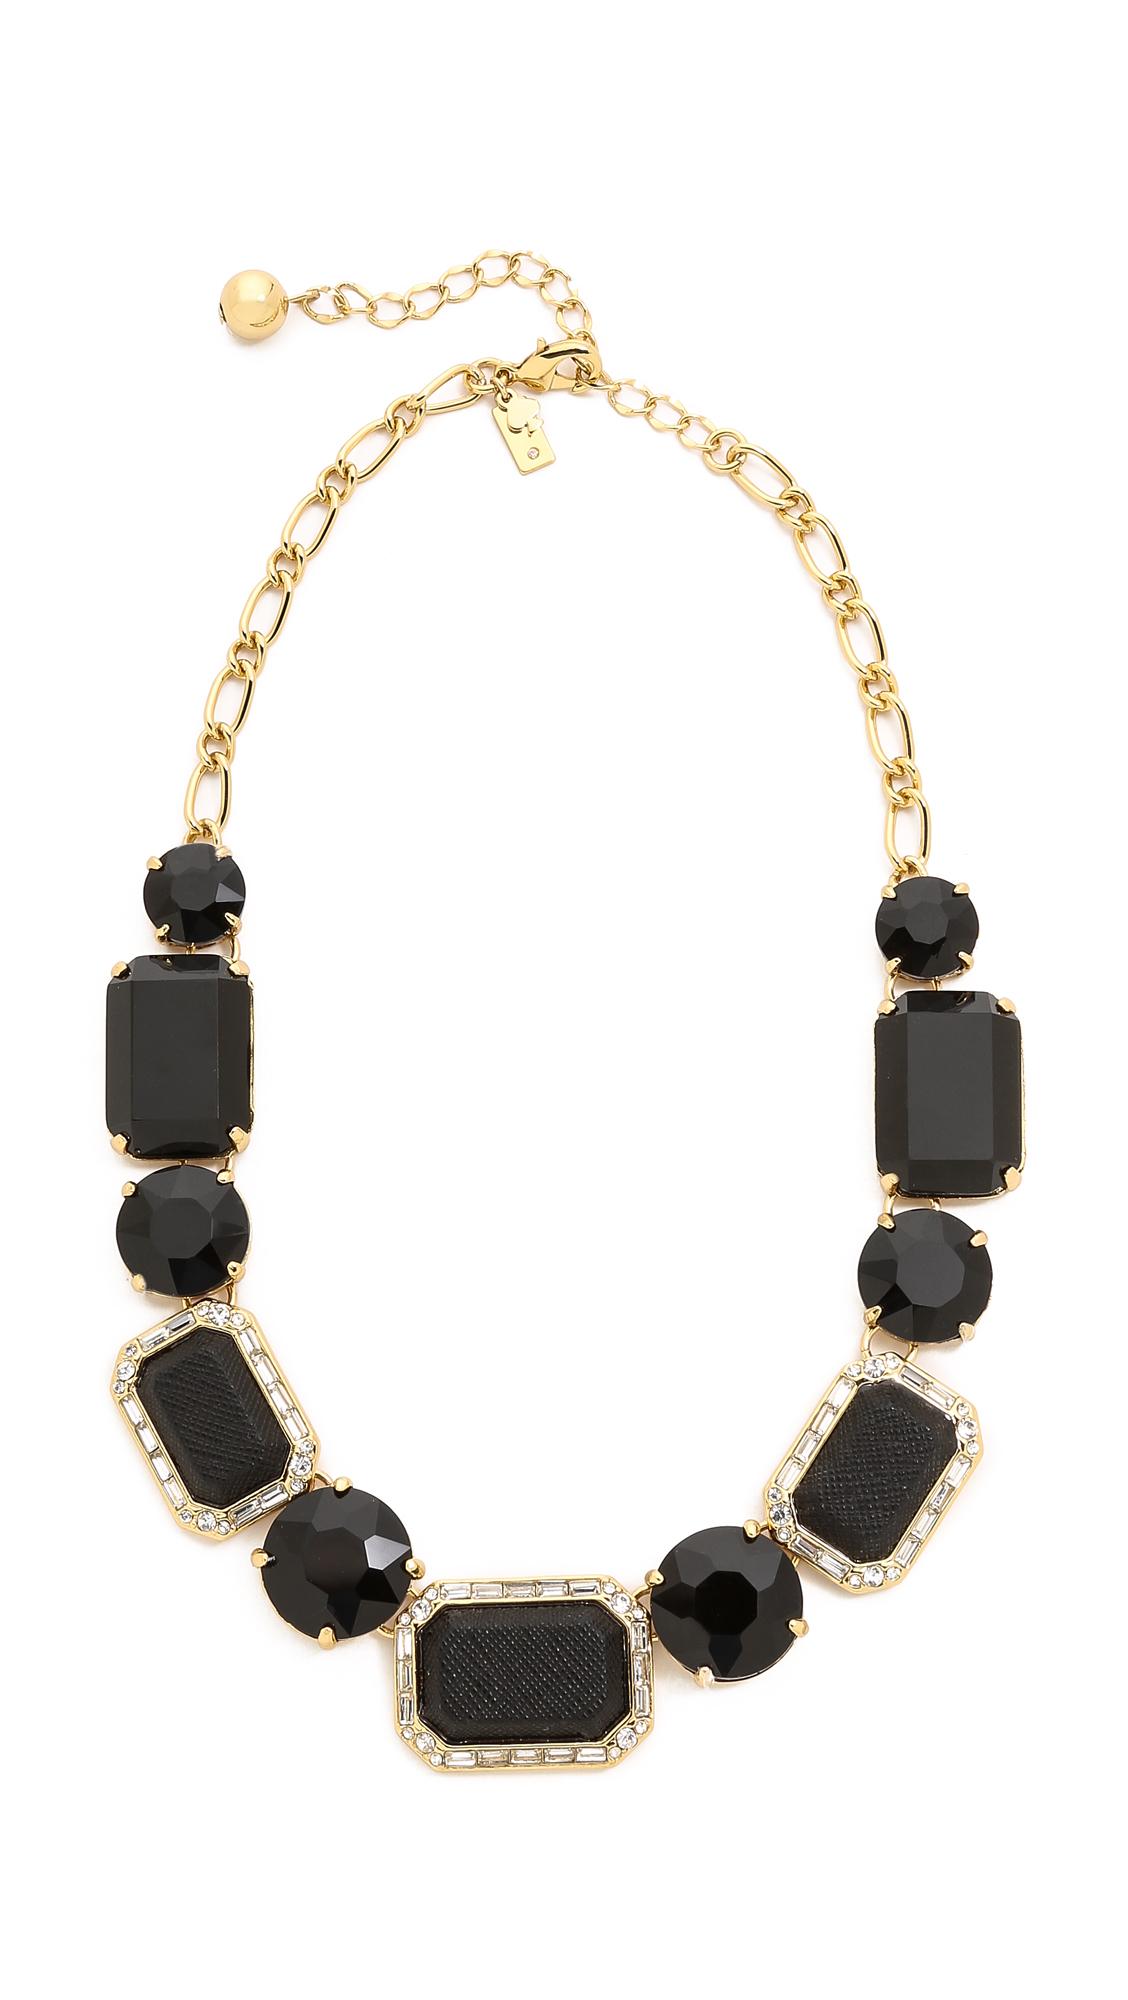 Lyst - Kate Spade New York Jackpot Jewels Necklace - Black